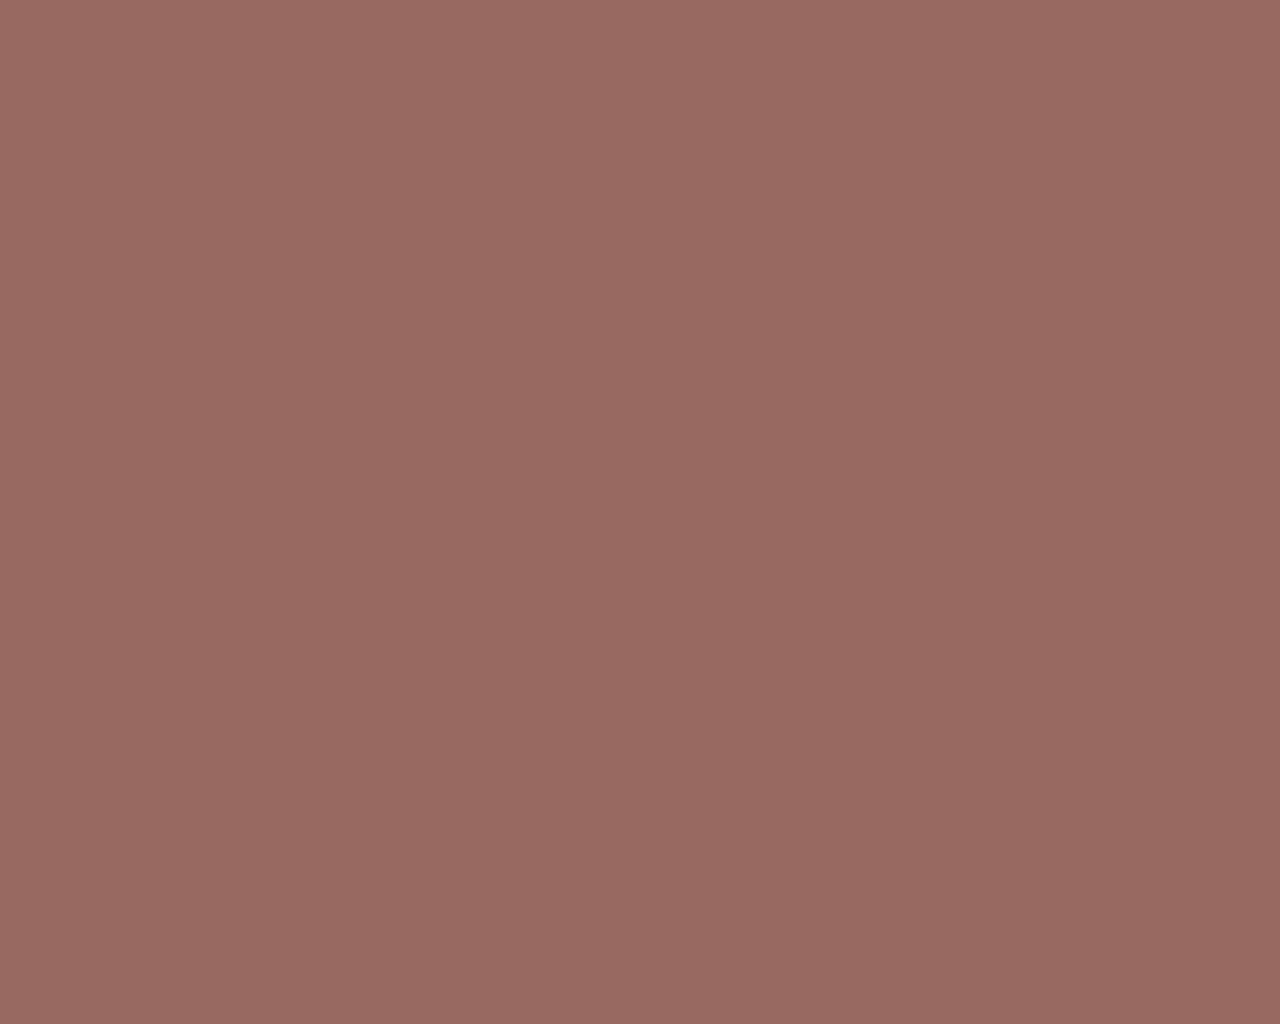 1280x1024 Dark Chestnut Solid Color Background